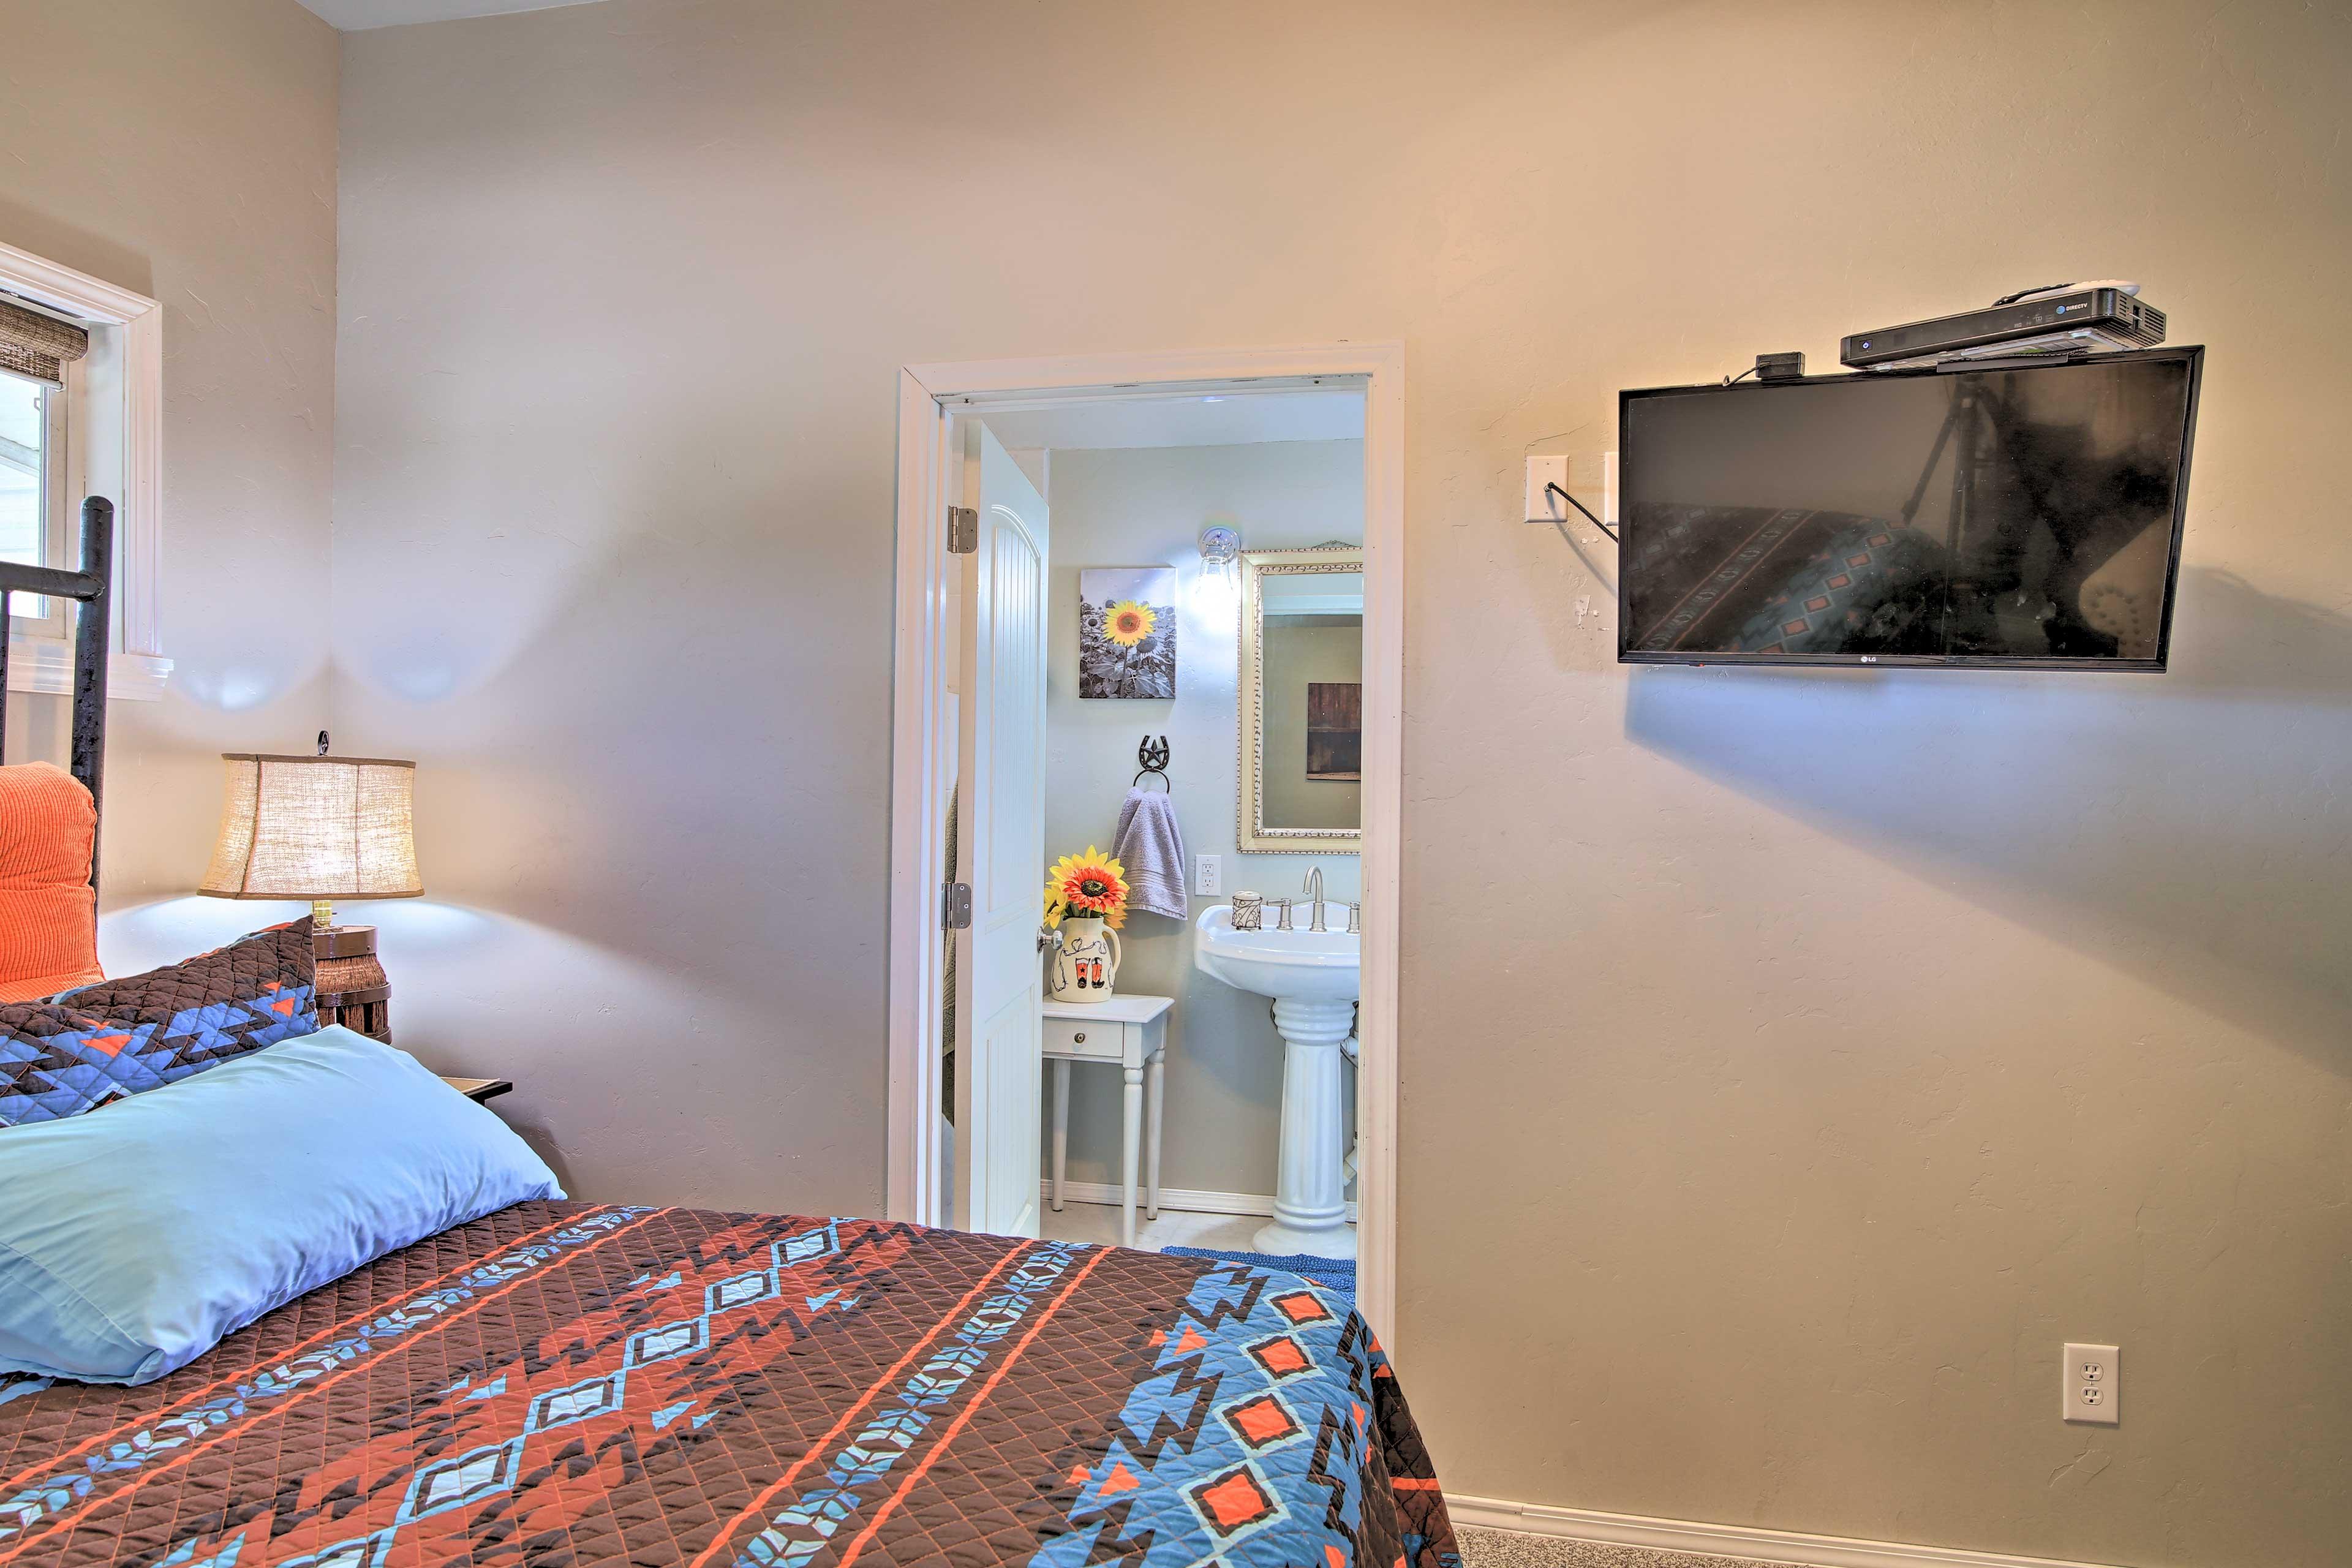 The second bedroom also has an en-suite bathroom!